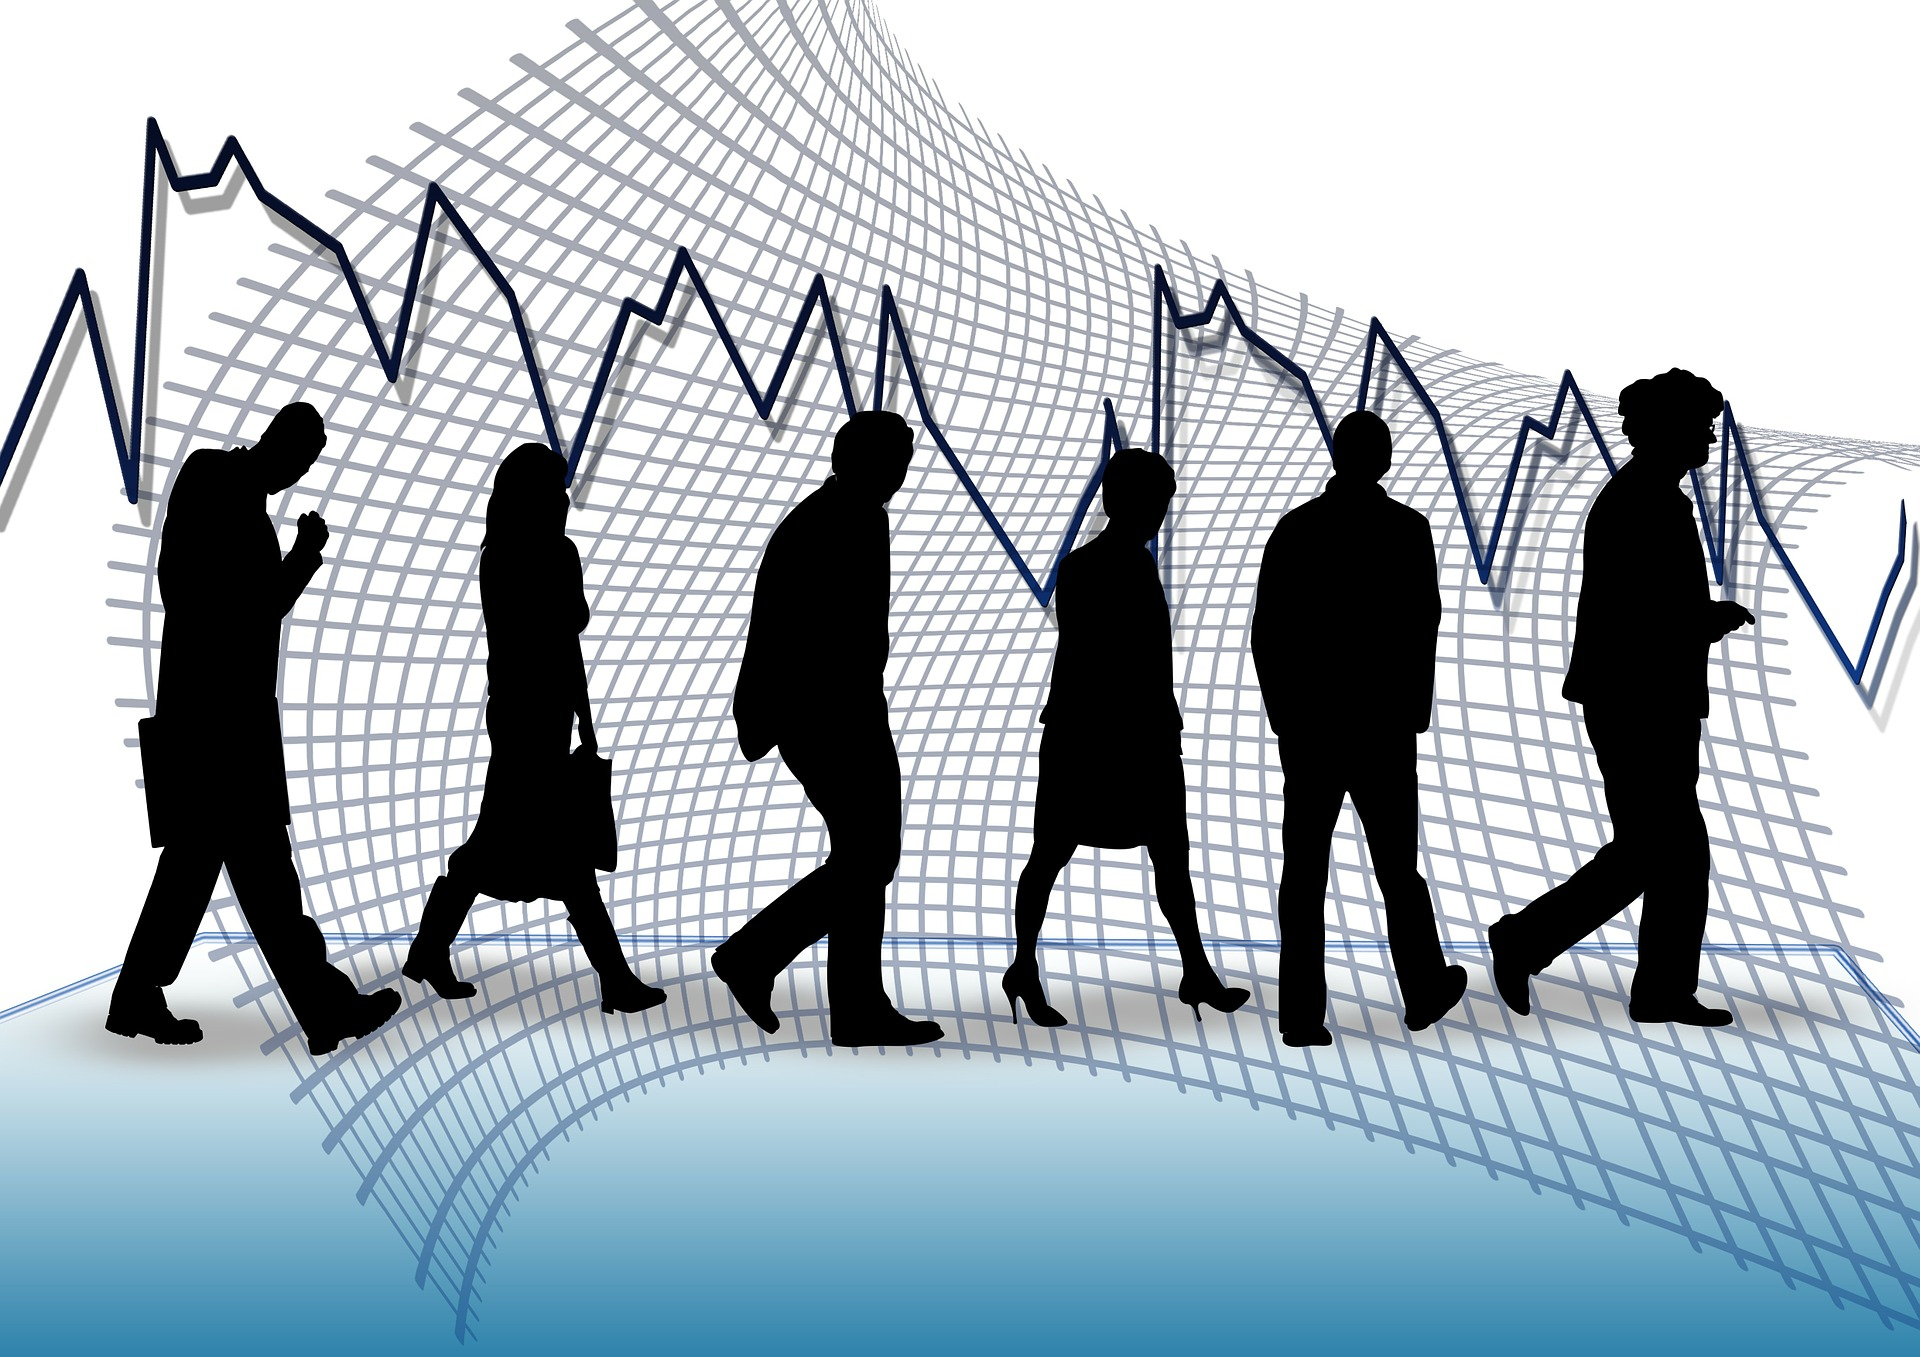 【M&Aインサイト】株式取得価格決定申立てに関する裁判例(取得価格が 0 円と認定された事例)